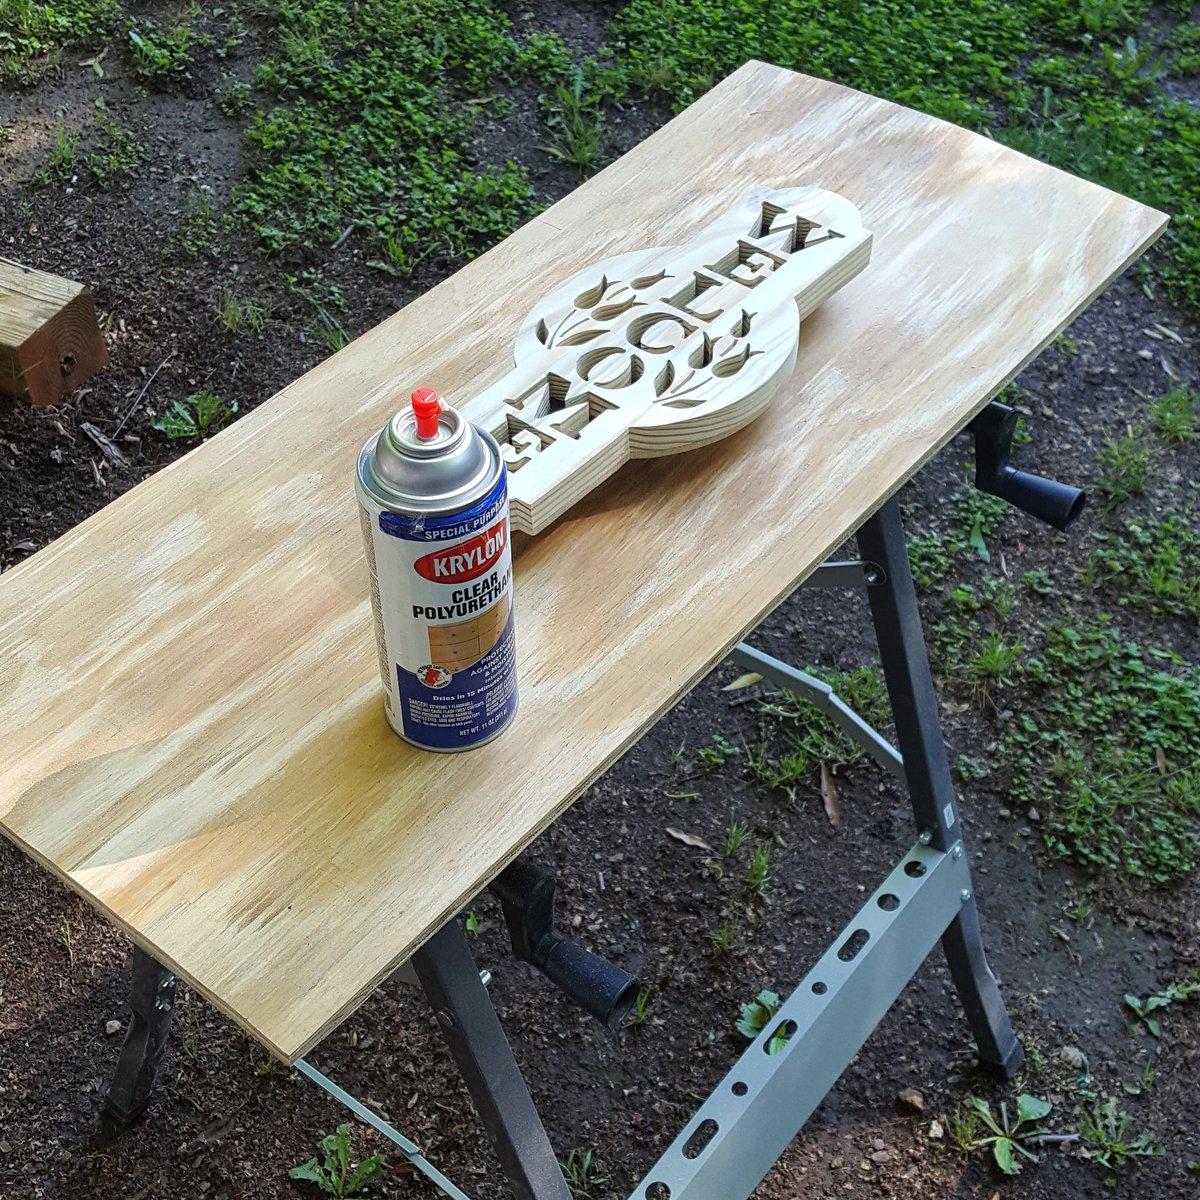 #ArtisanPirate #artisan #pirate #maker #mentor #artist #woodworker #entrepreneur #follow #scrollsaw #wood #woodwork #woodworking #handmade #diy #welcomesign #welcome #sign #palletwood #upcycle #rustic #southern #workinprogress #craftsman #deltatools #GodBless #GodIsGood #Blessed